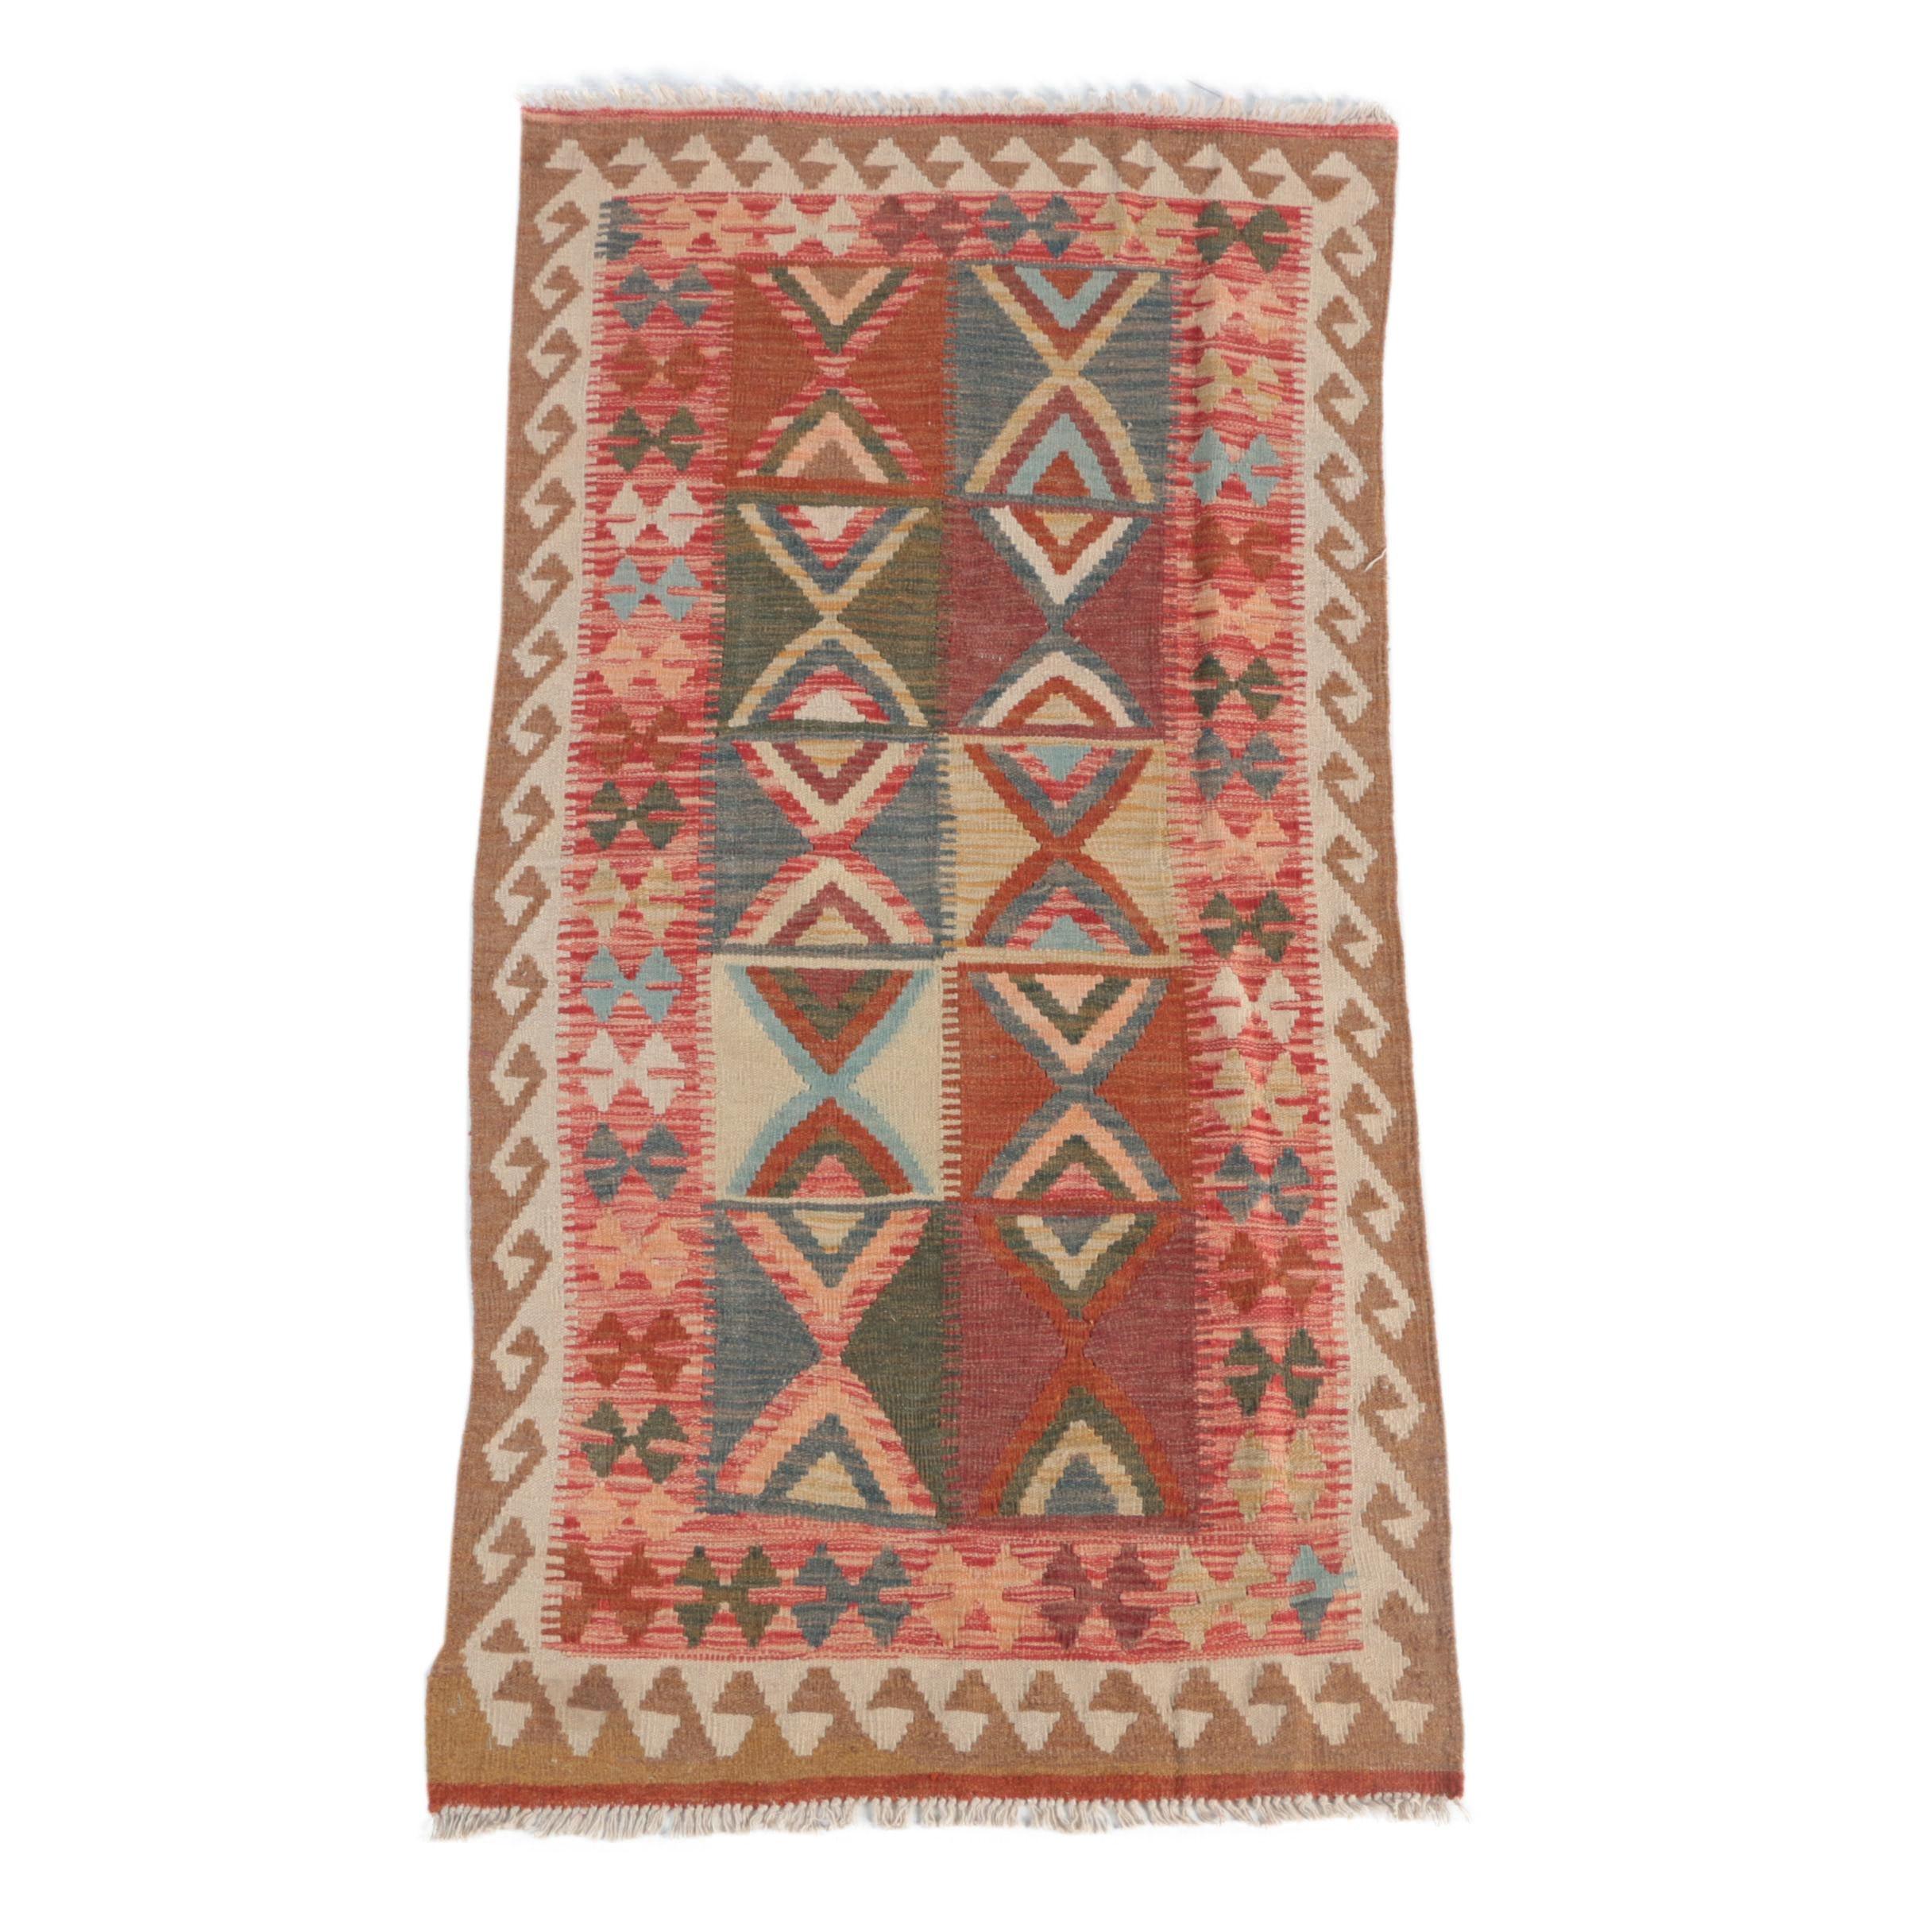 Handwoven Turkish Wool Kilim